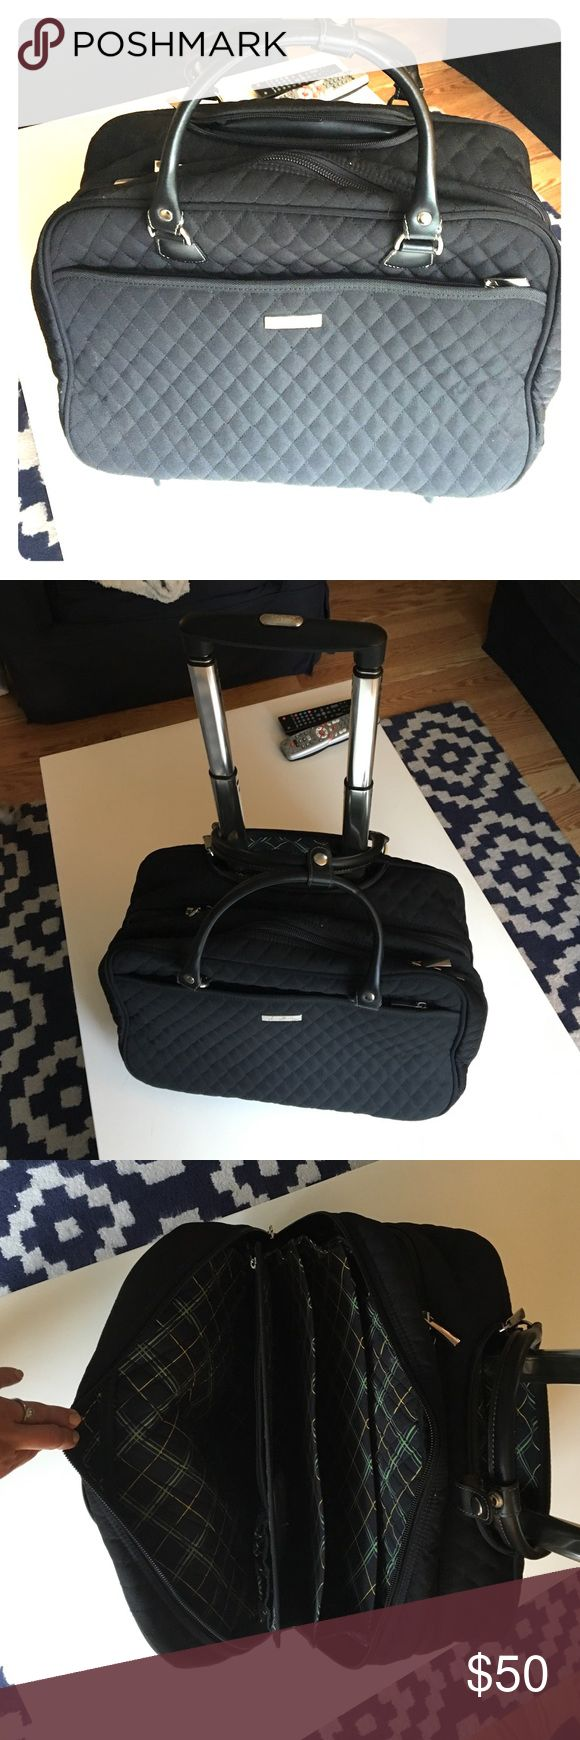 Black vera bradley travel bag black carry on w rolling wheels and adjustable handle